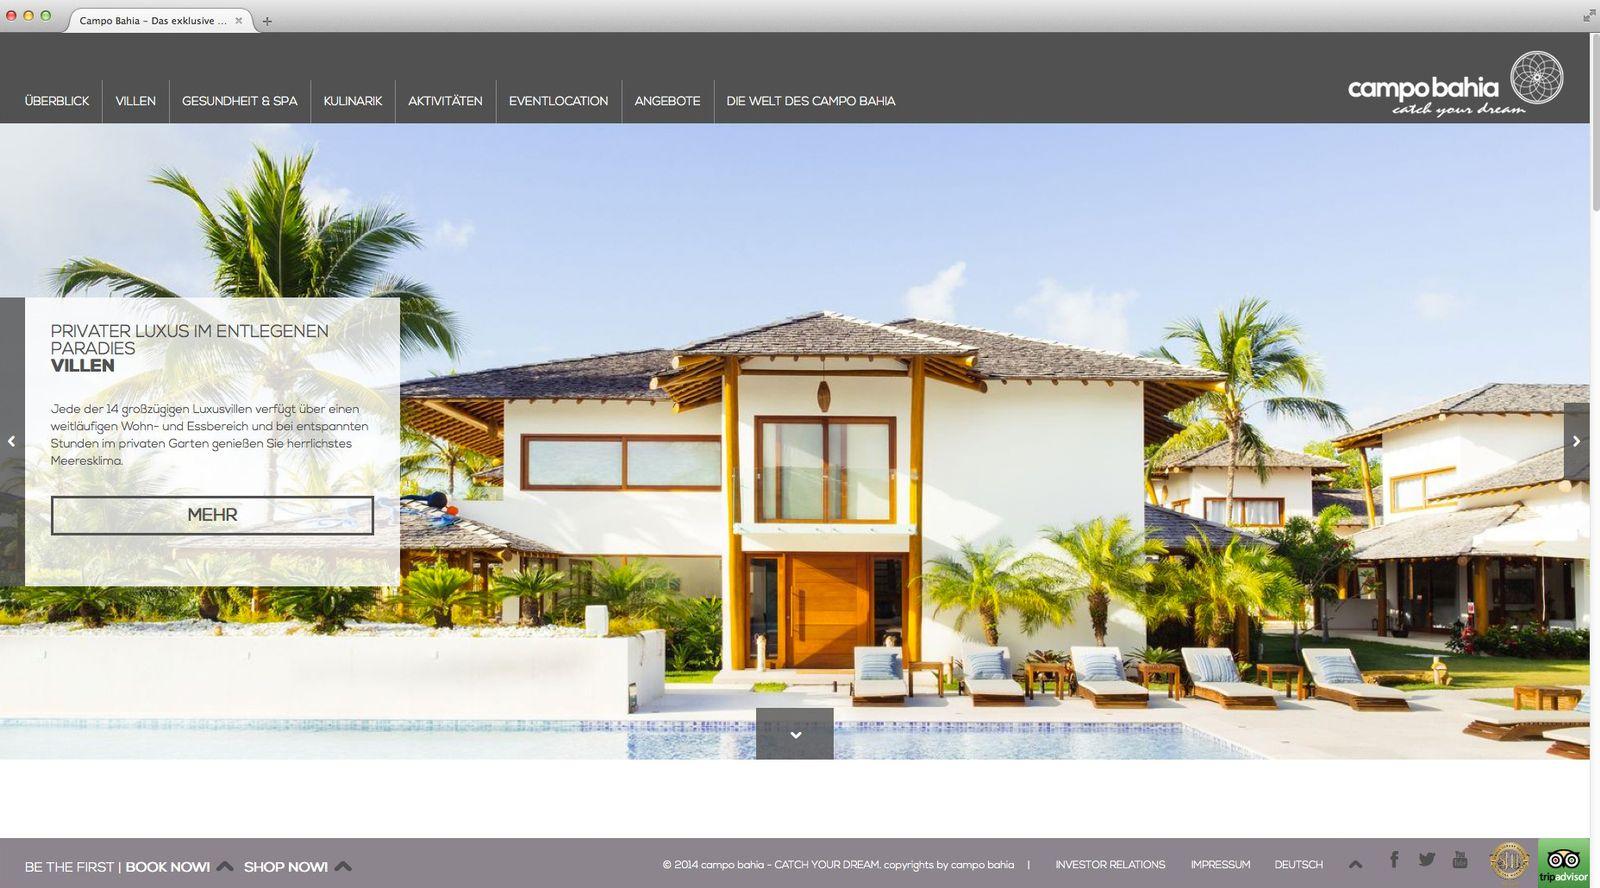 NUR ALS ZITAT Screenshot Campo Bahia